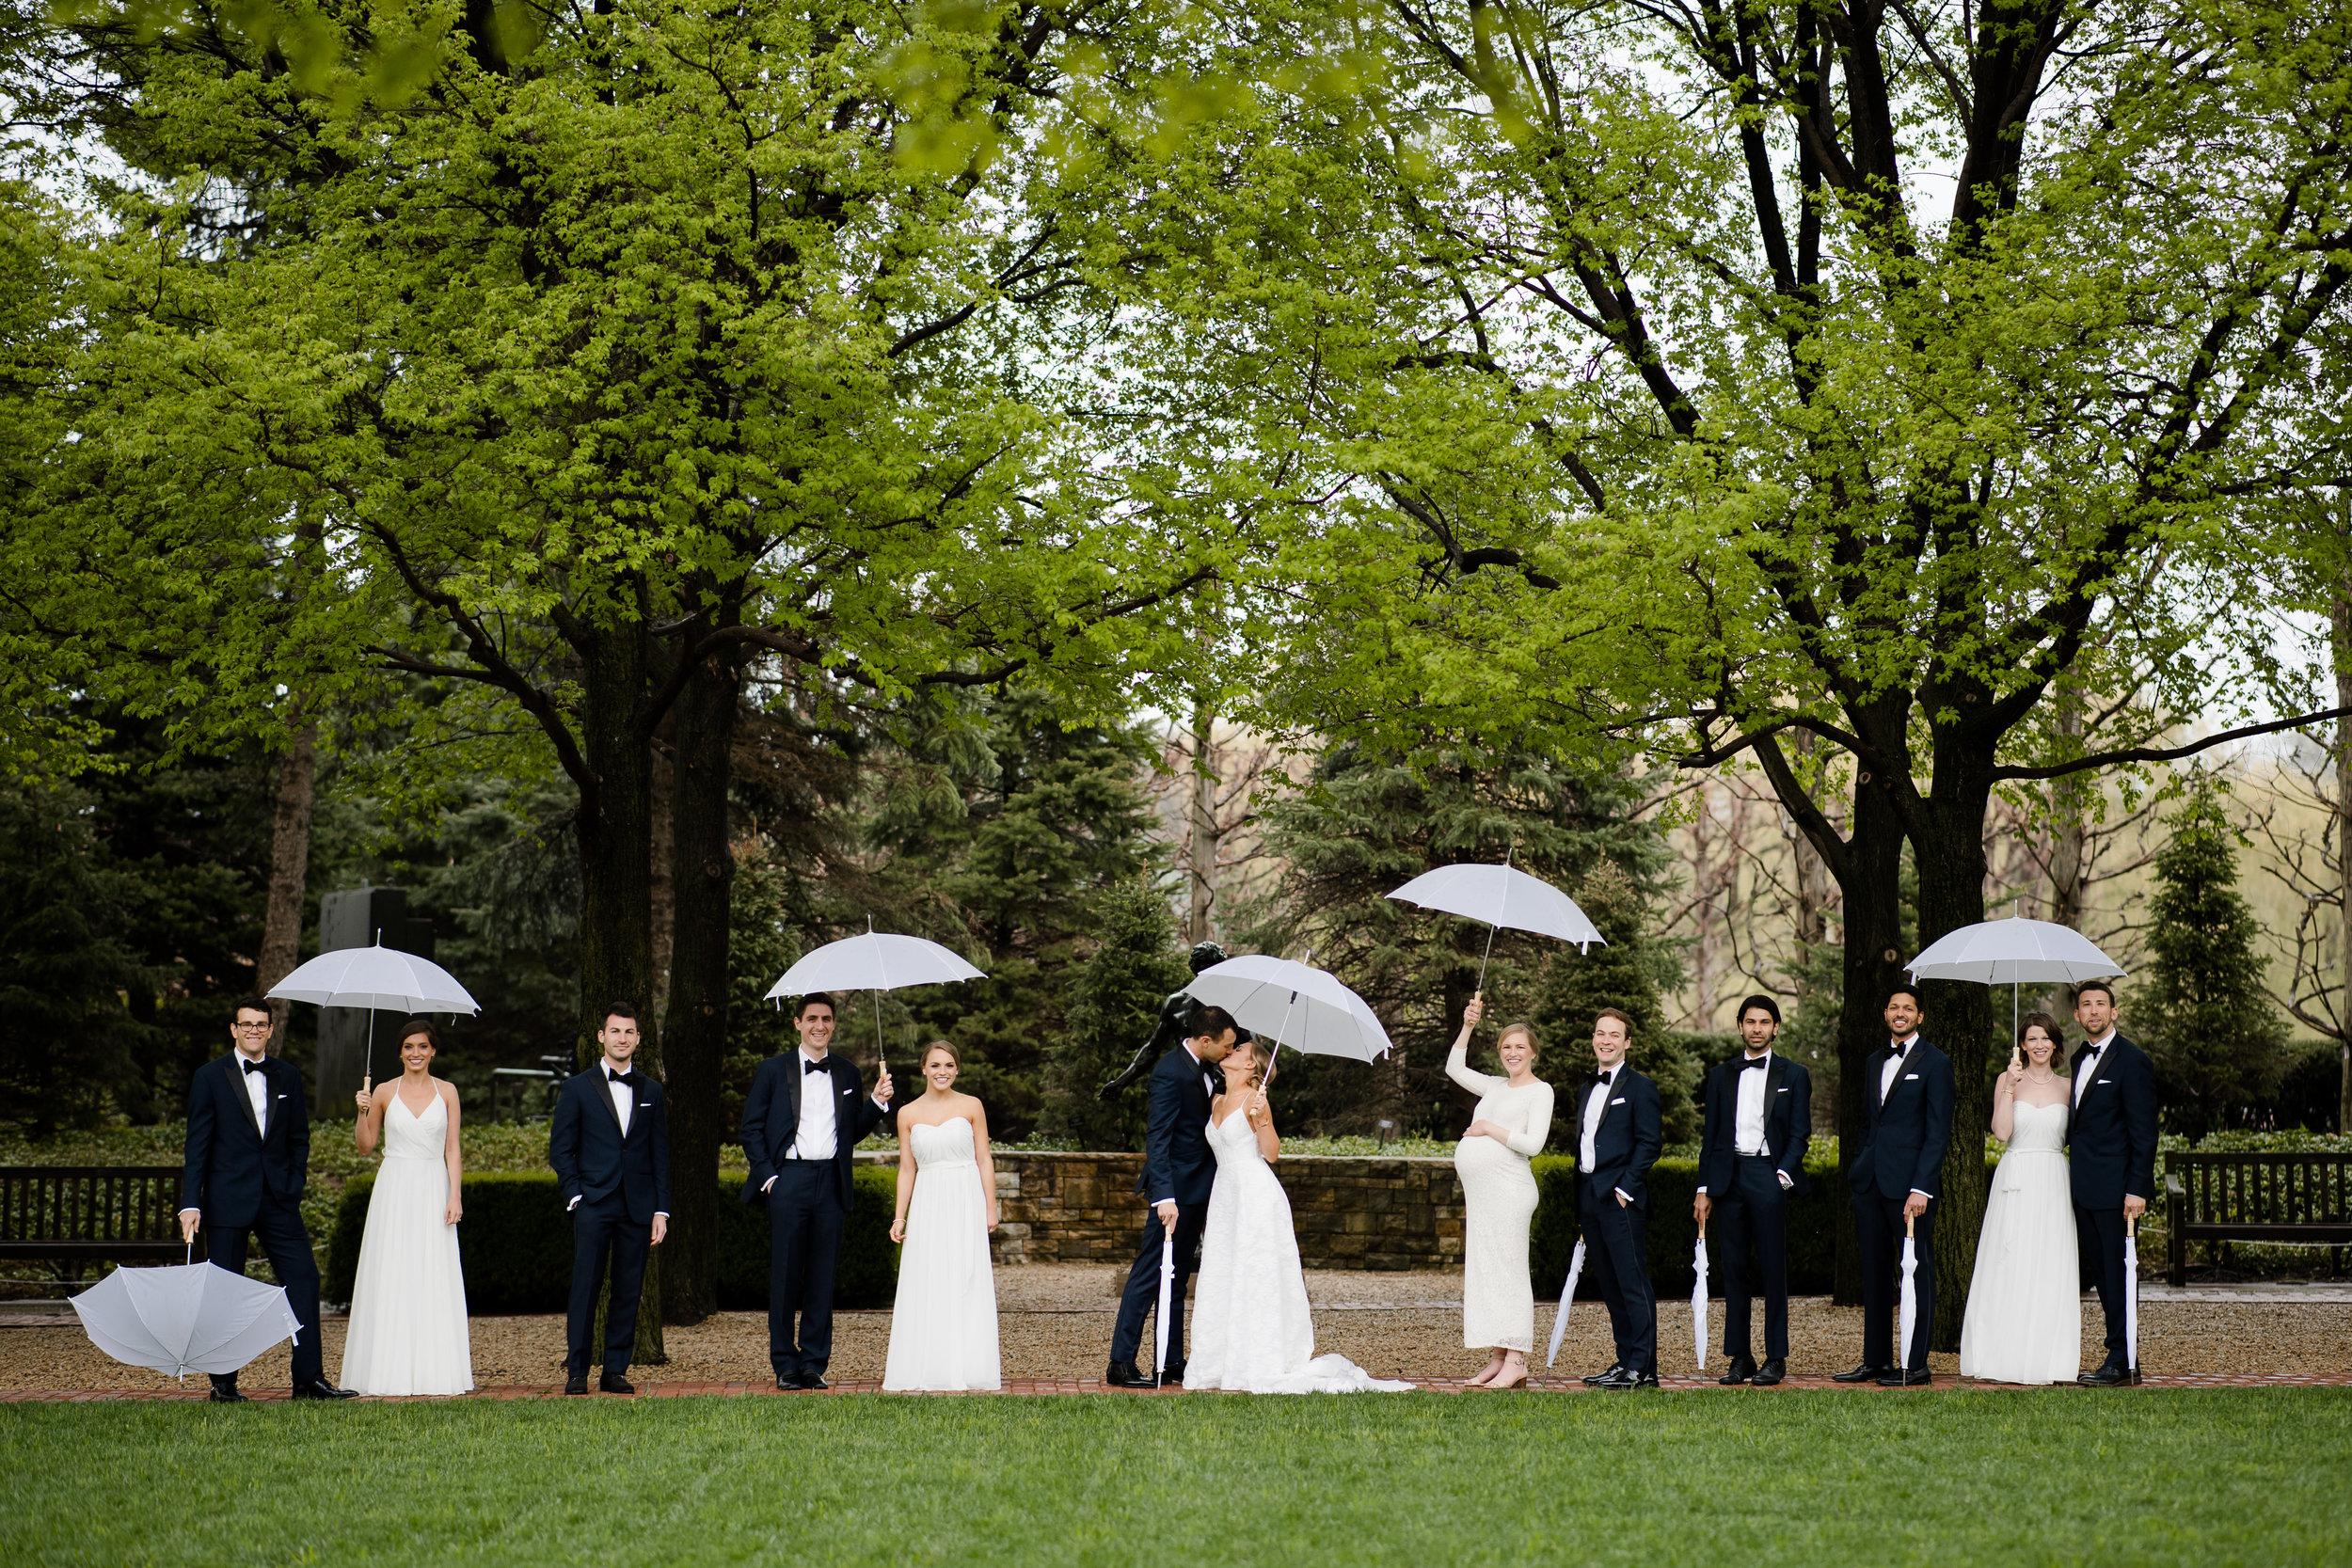 spring wedding at the chicago botanic garden21.jpg